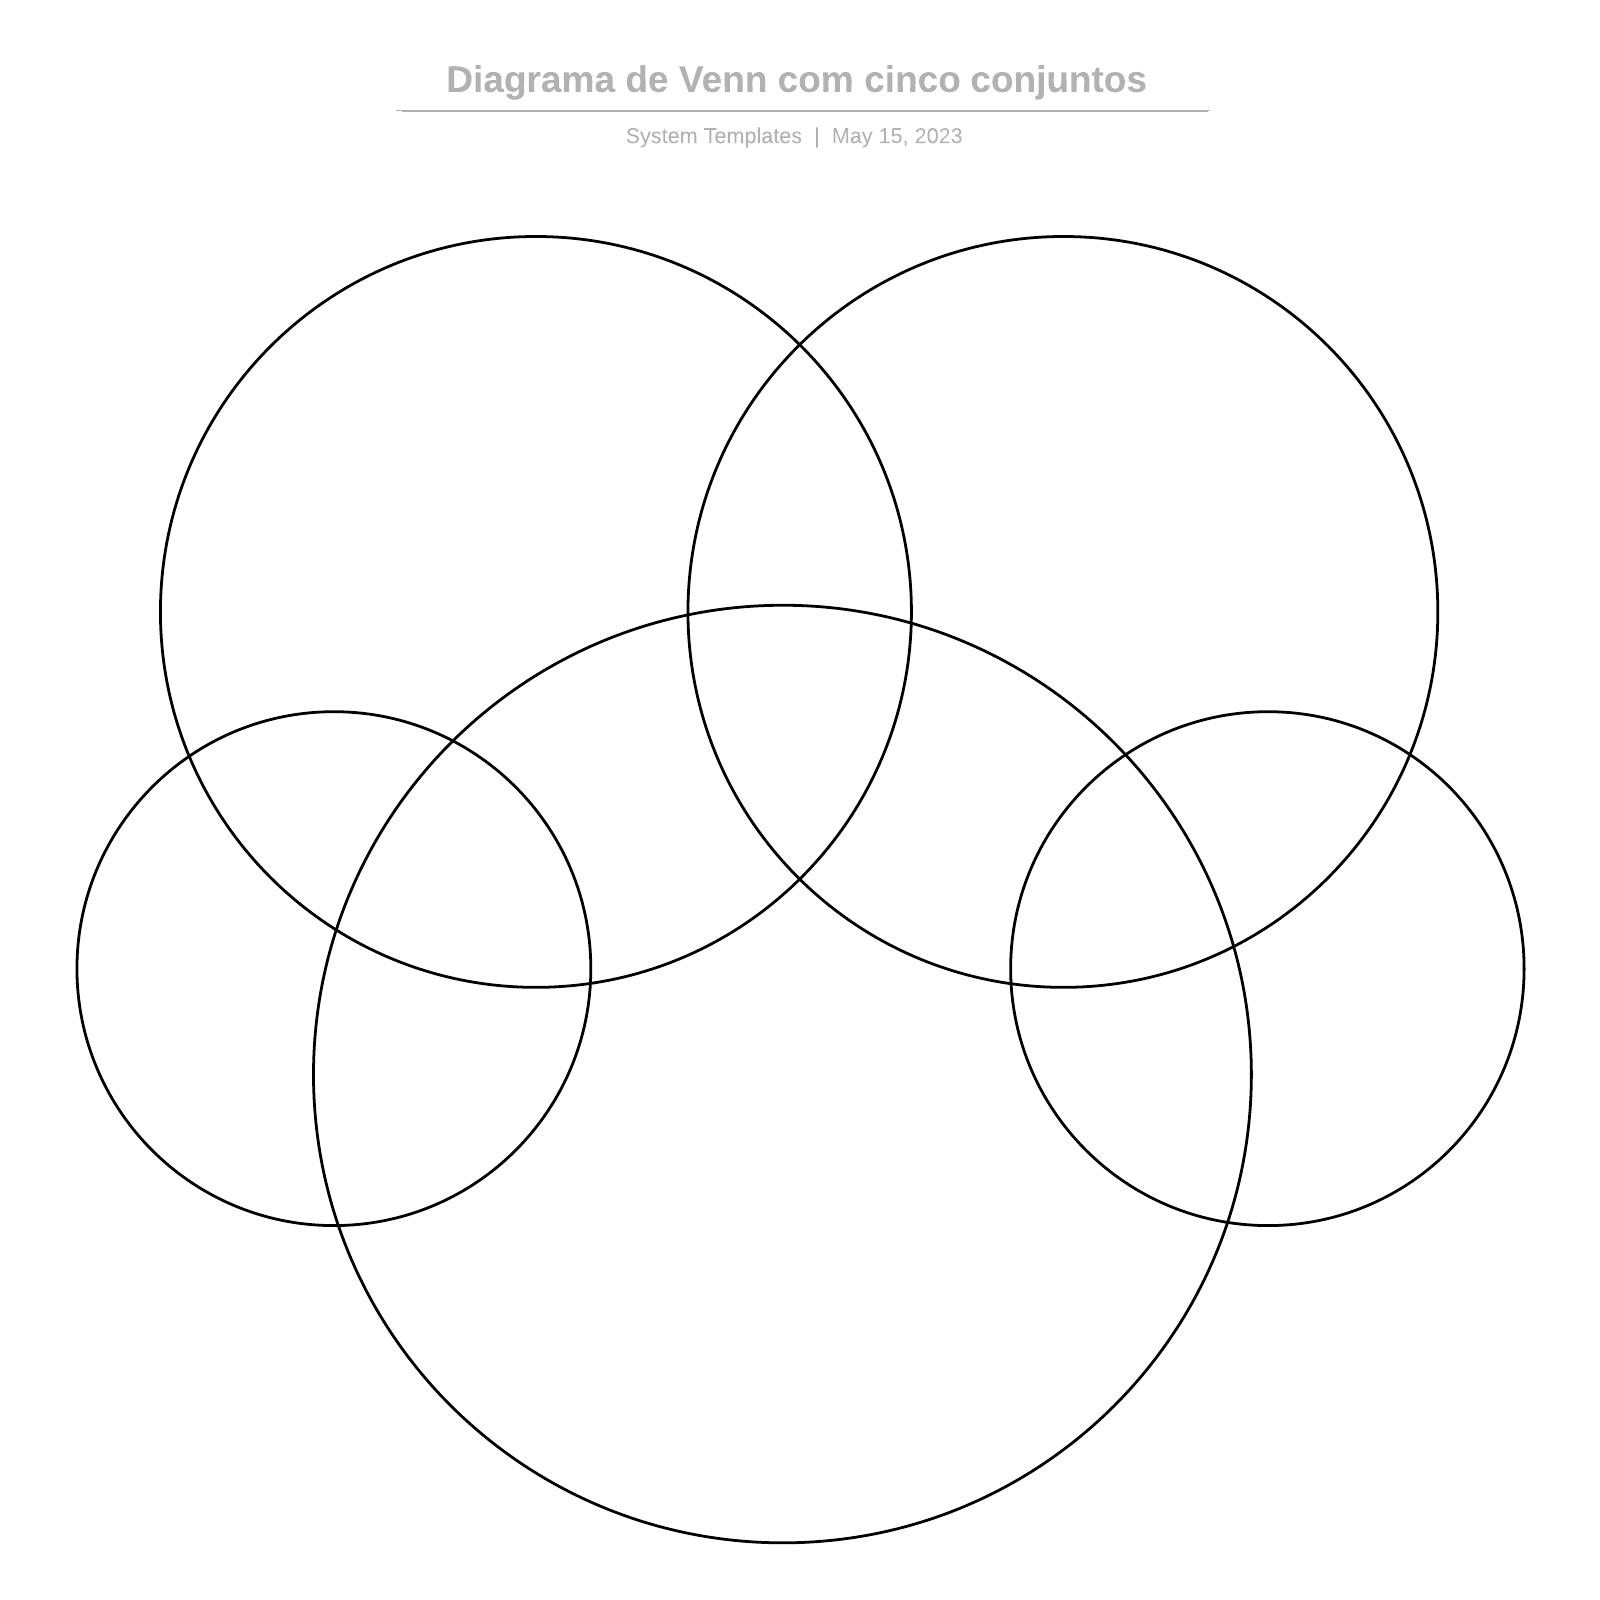 Diagrama de Venn com cinco conjuntos